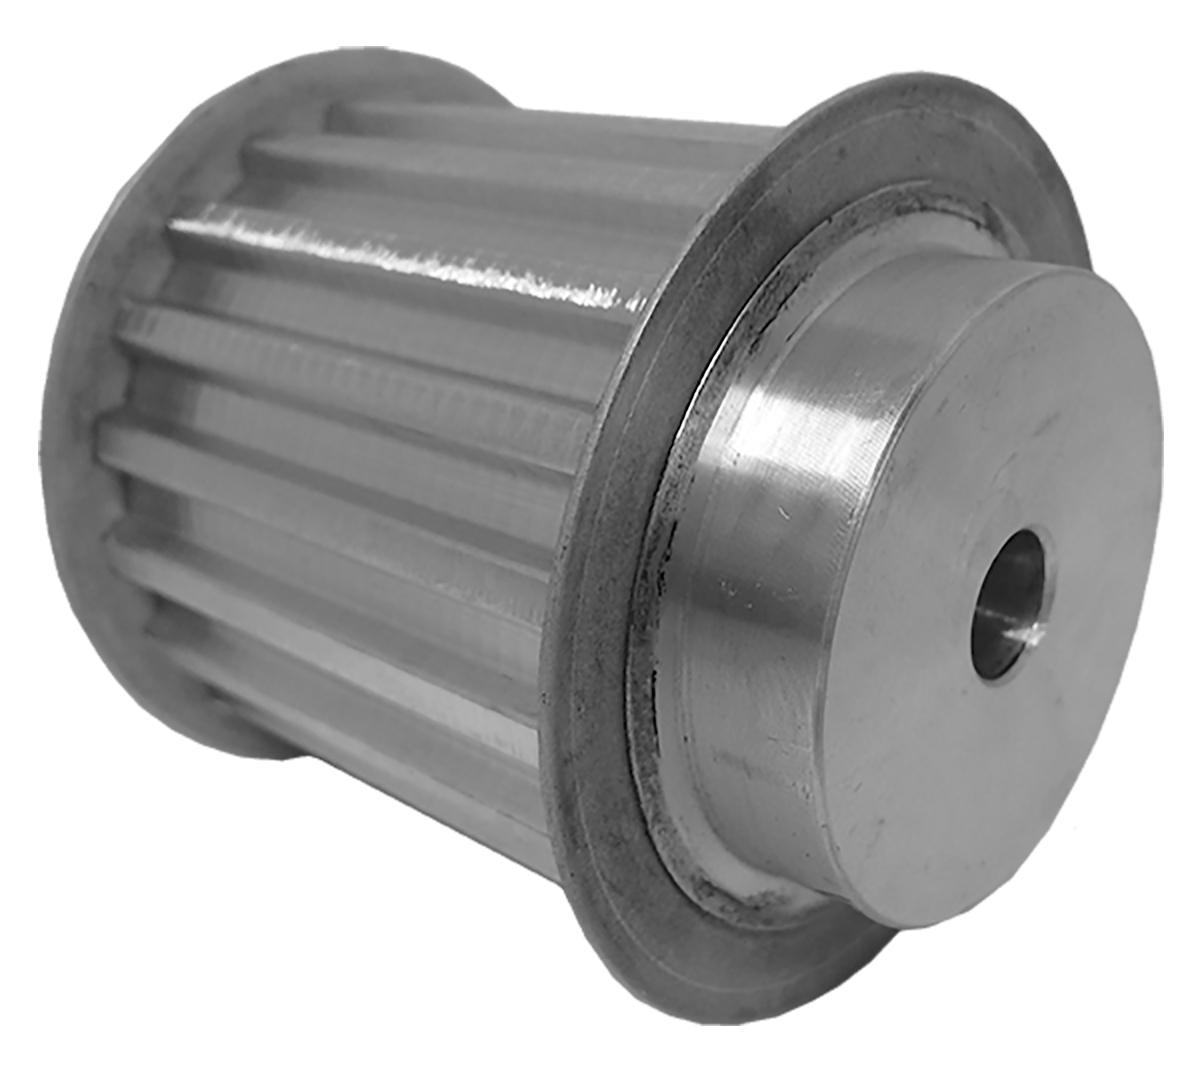 66T10/19-2 - Aluminum Metric Pulleys